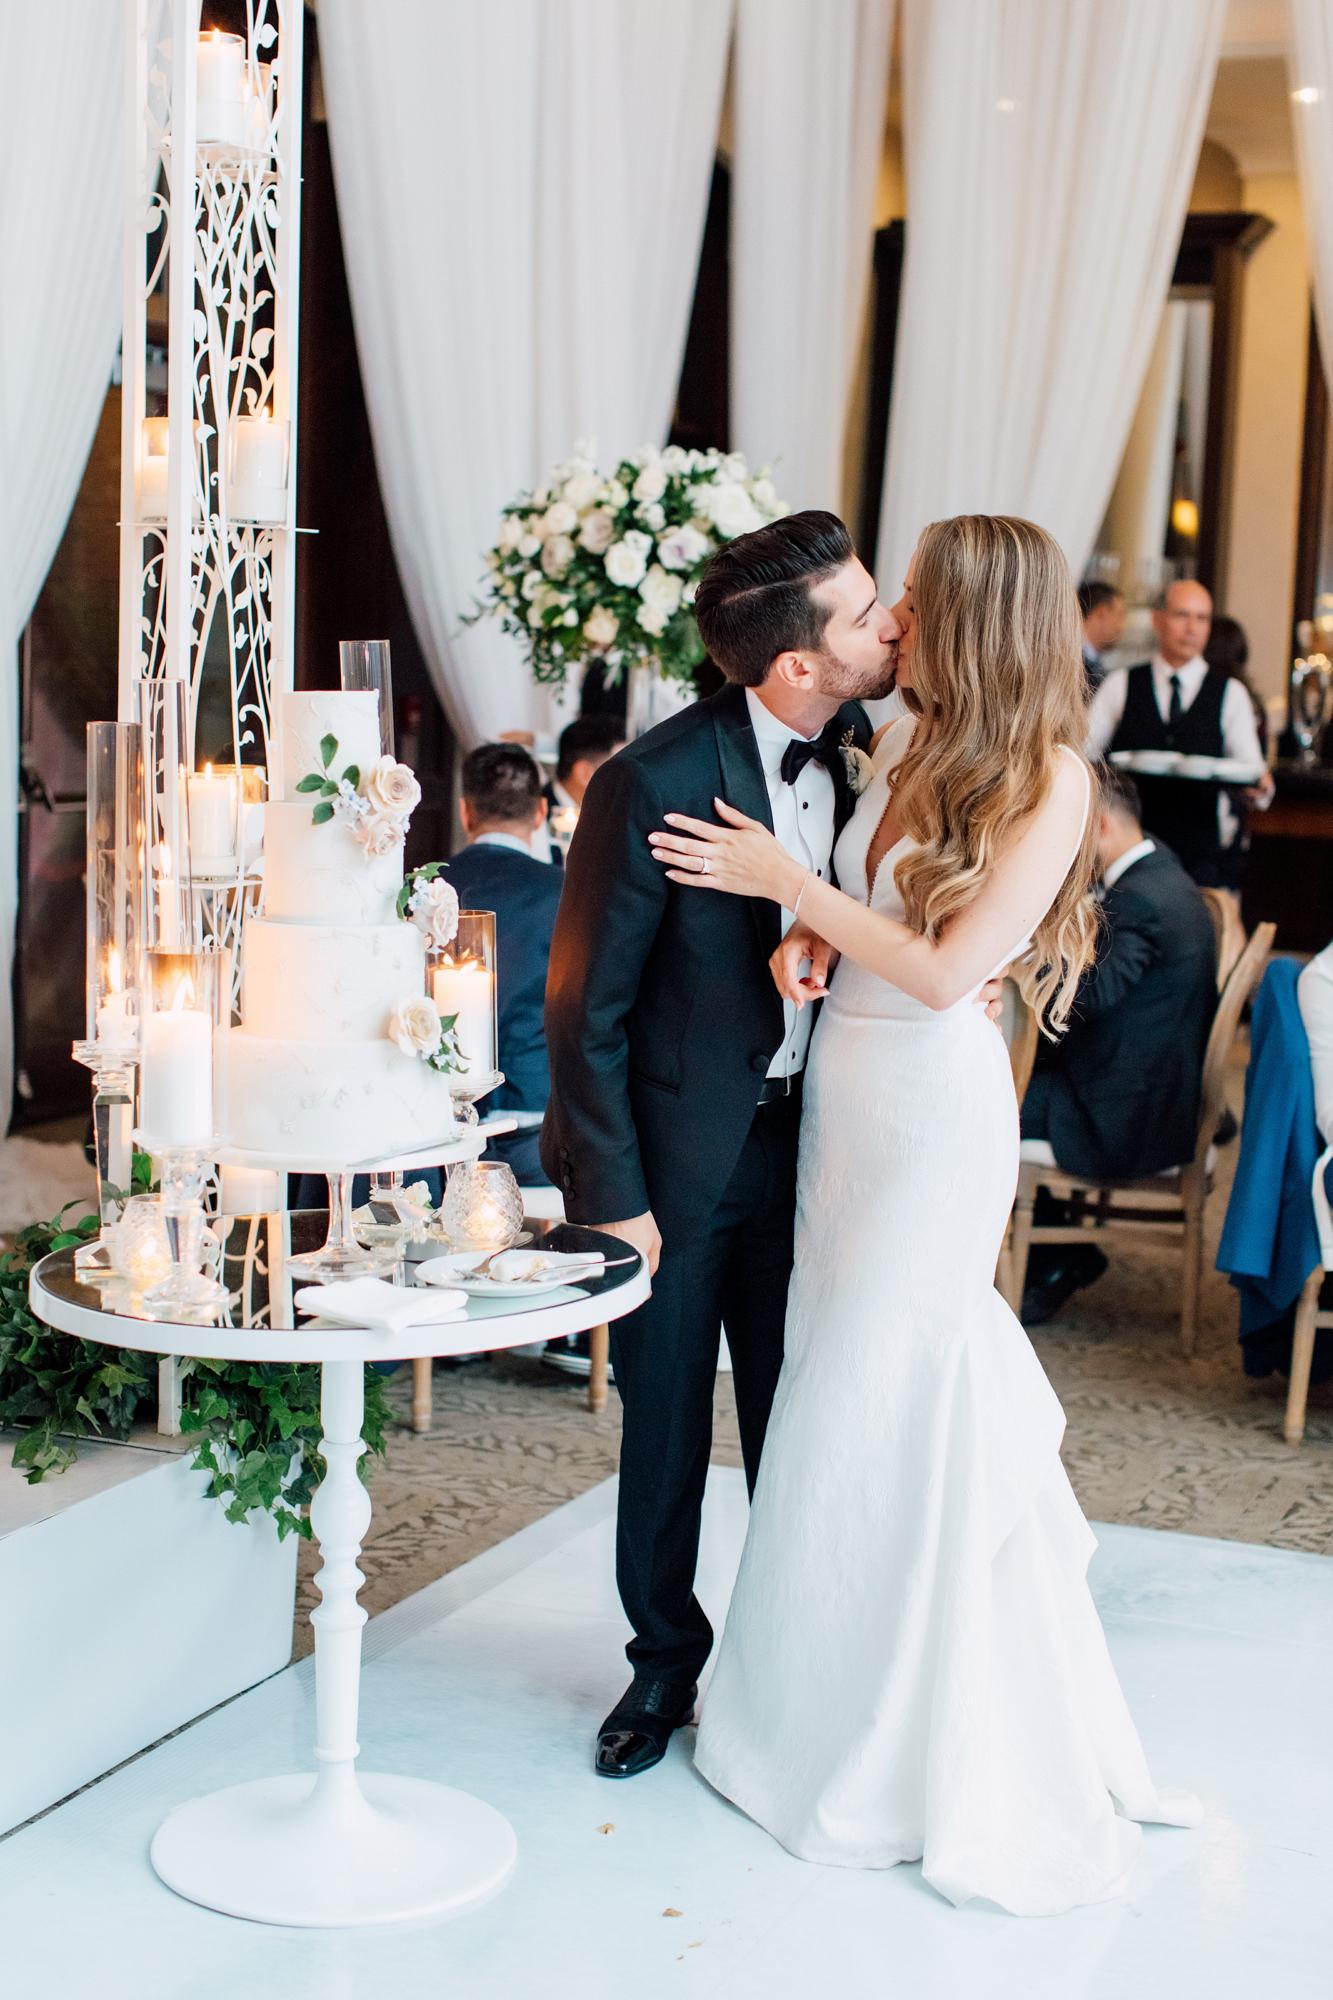 shealyn angus wedding cake cutting